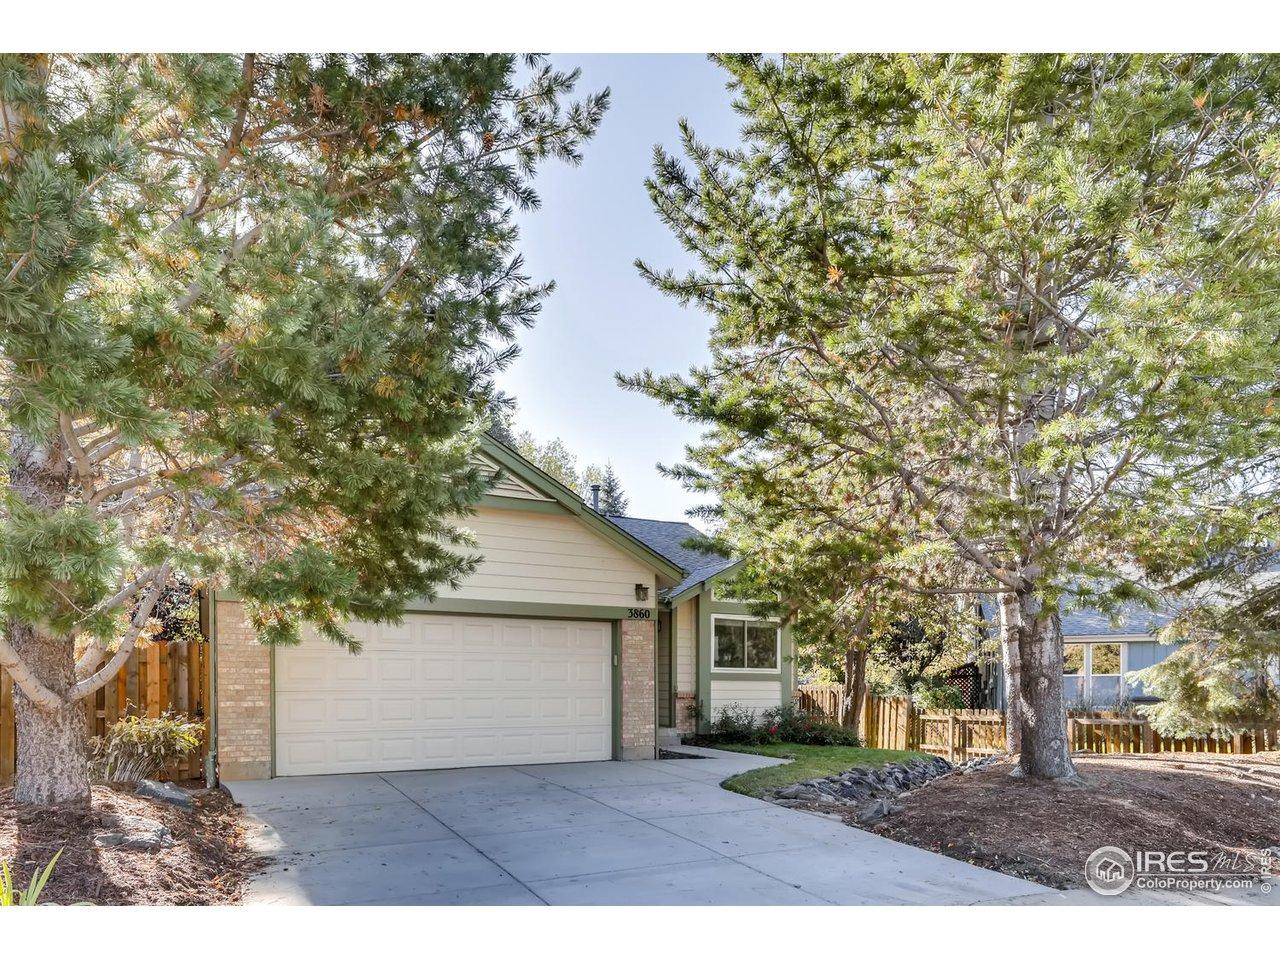 3860 Campo Ct, Boulder CO 80301